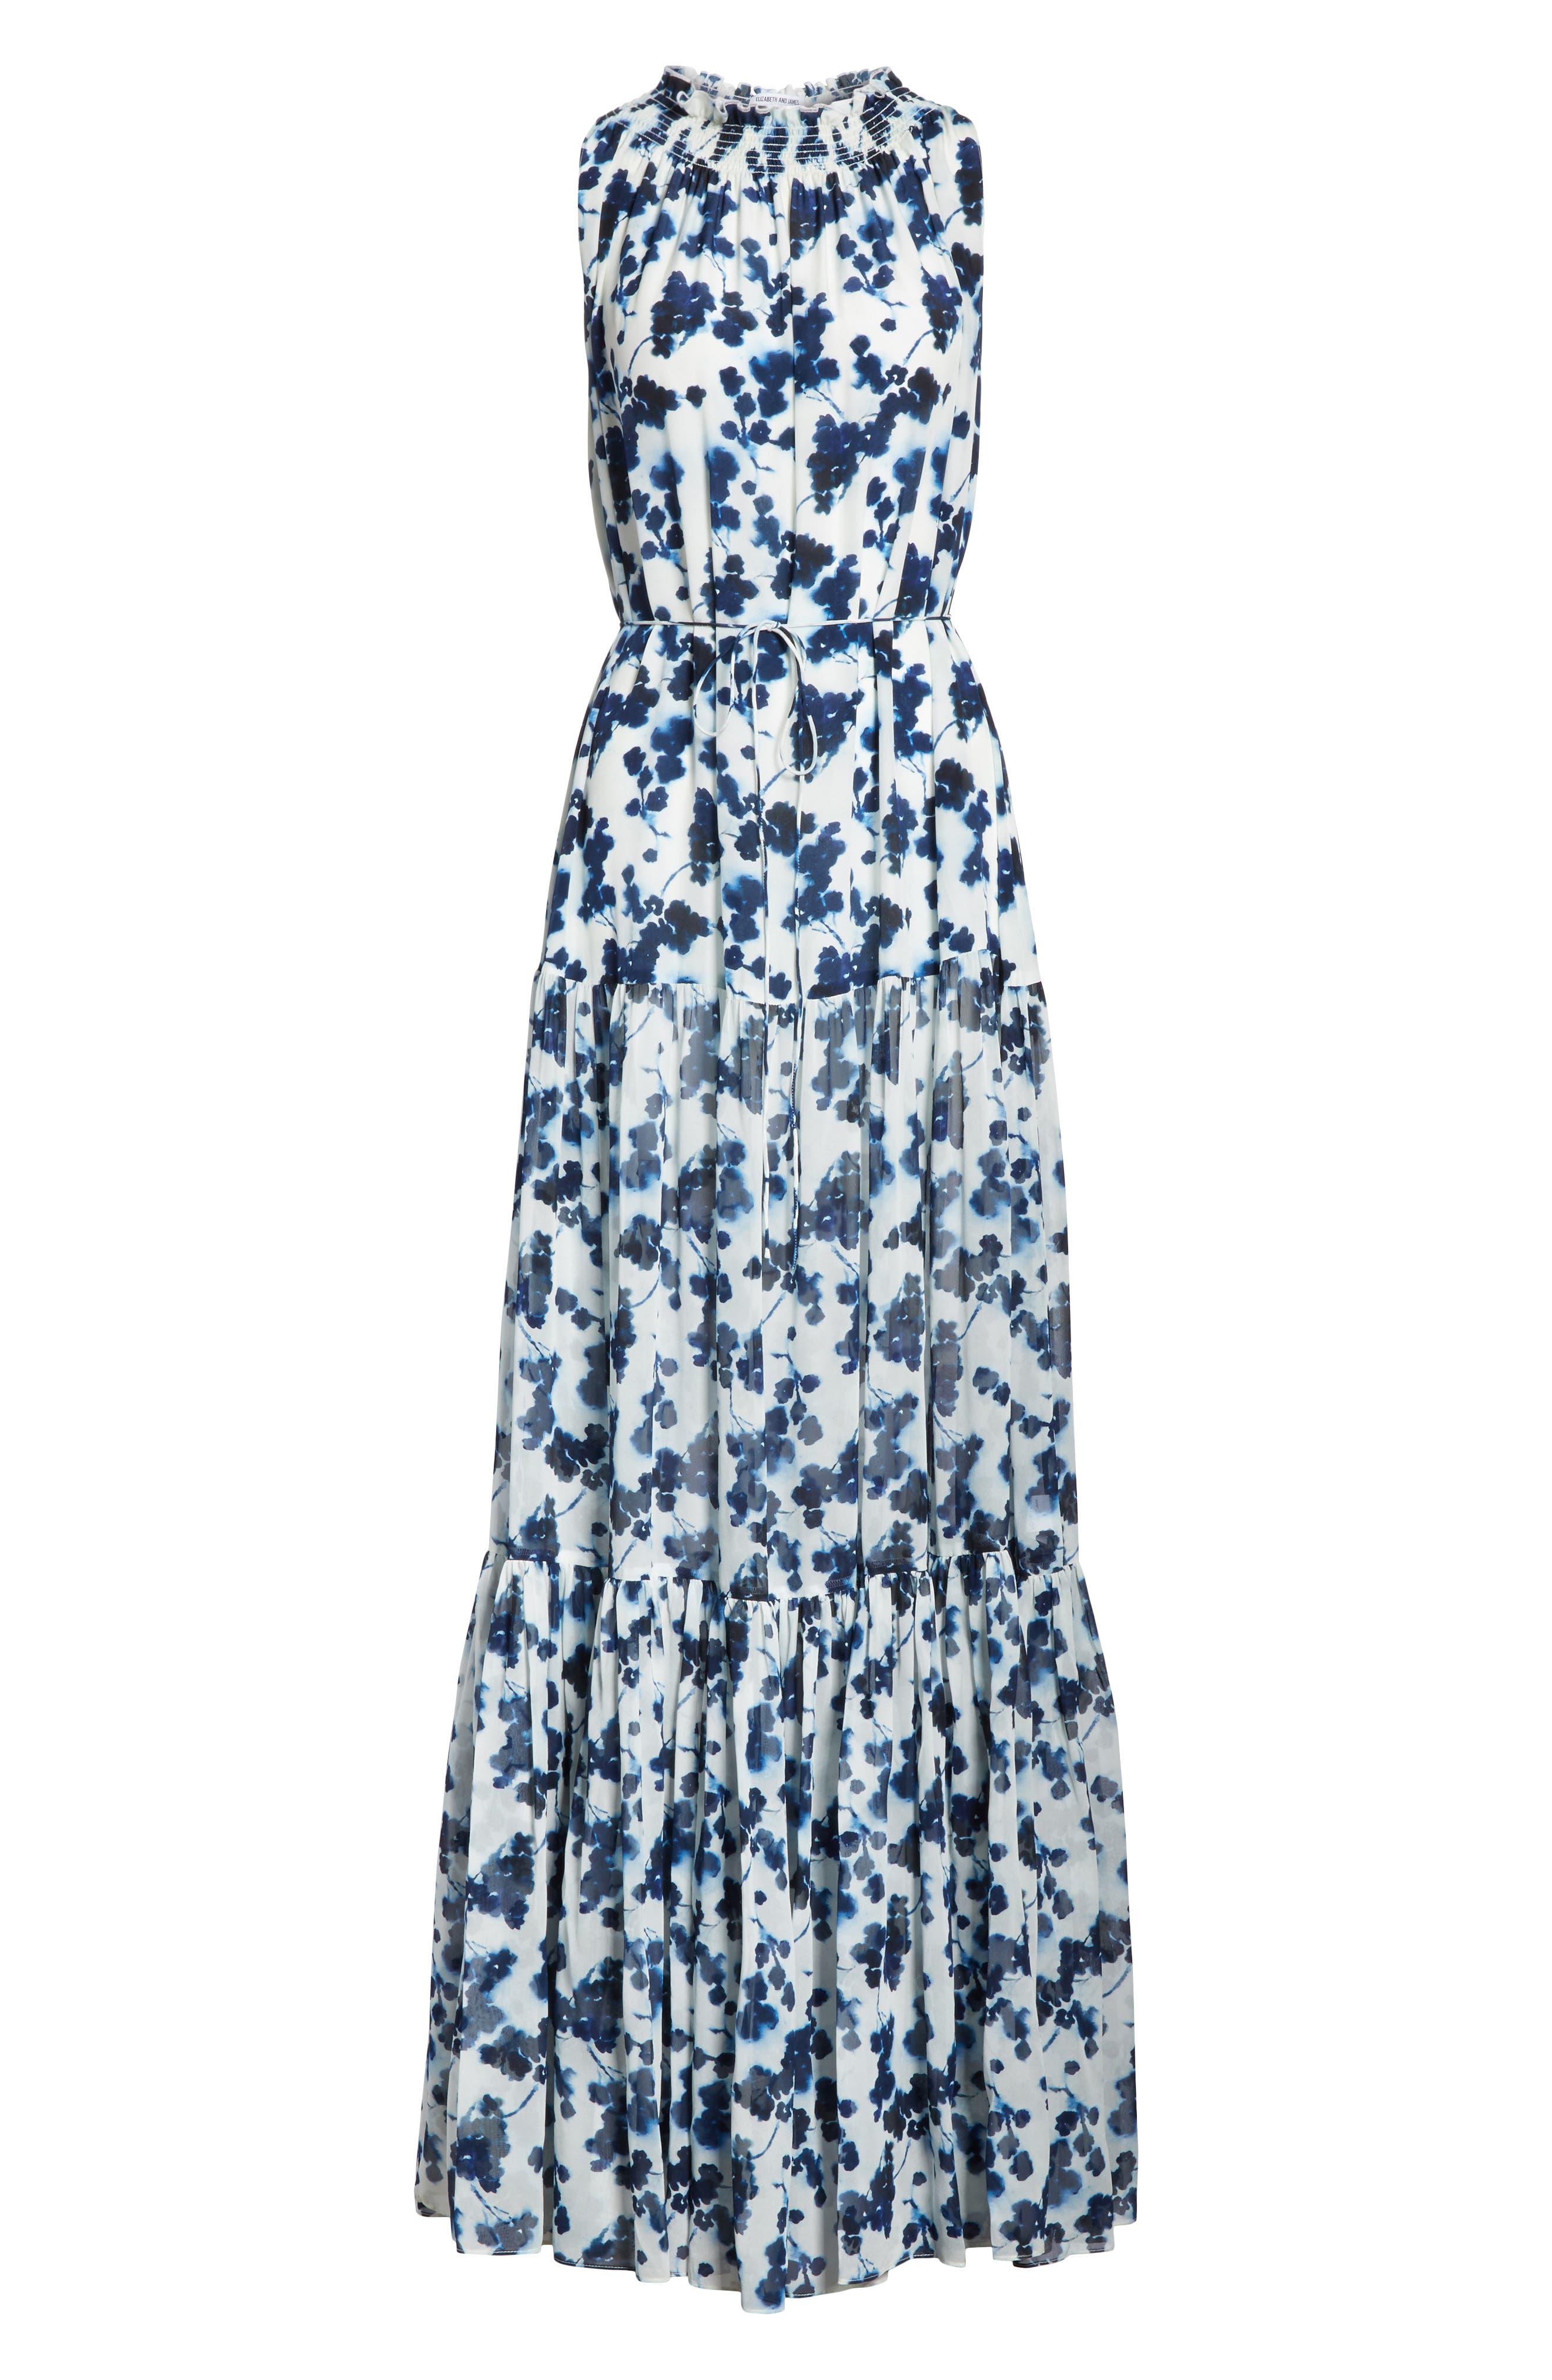 Lani P Floral Print Silk Dress,                             Alternate thumbnail 6, color,                             426